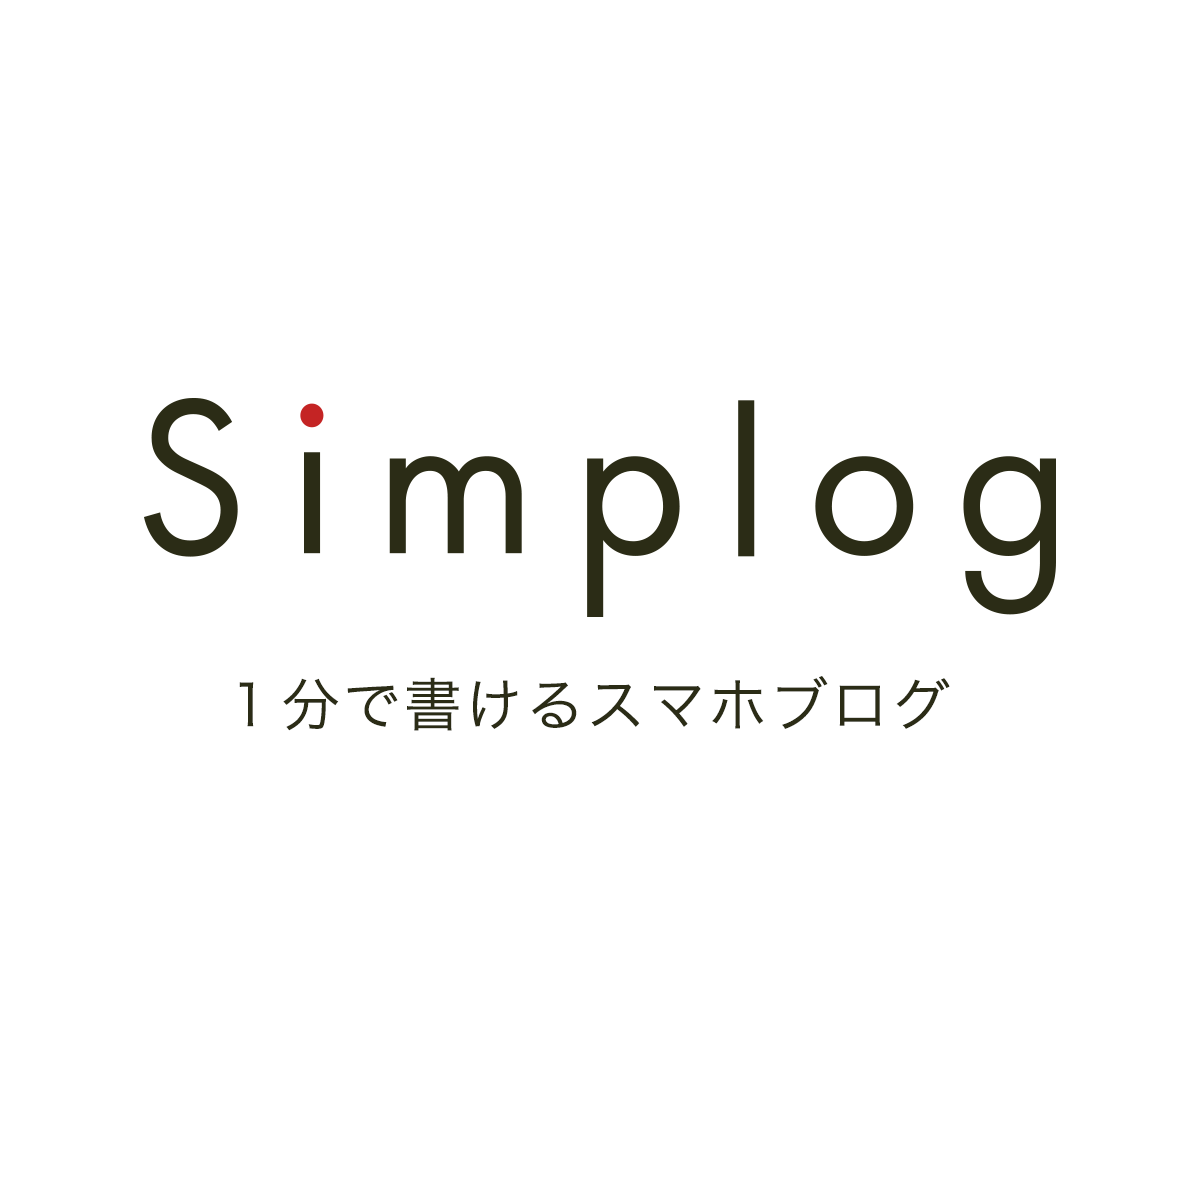 Simplog facebook img 02